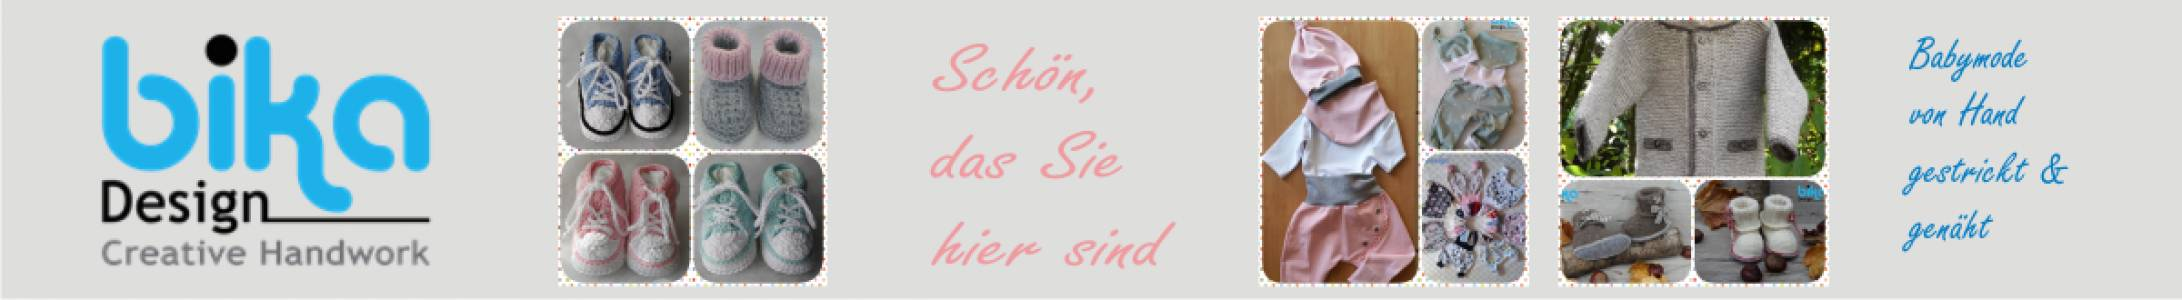 Bika-Design auf kasuwa.de